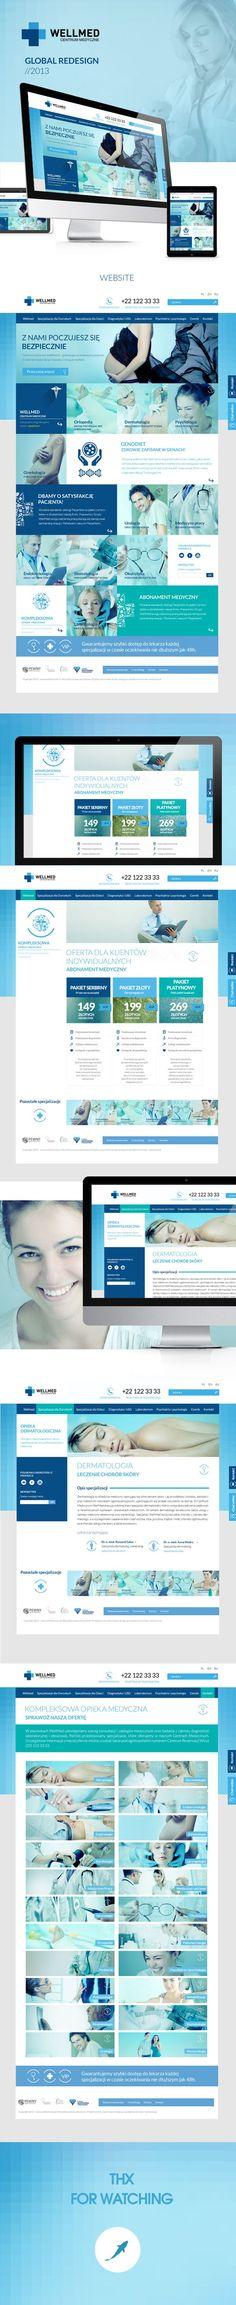 Wellmed - Centrum Medyczne by Tomasz Trefler, via Behance #medical #website #design: